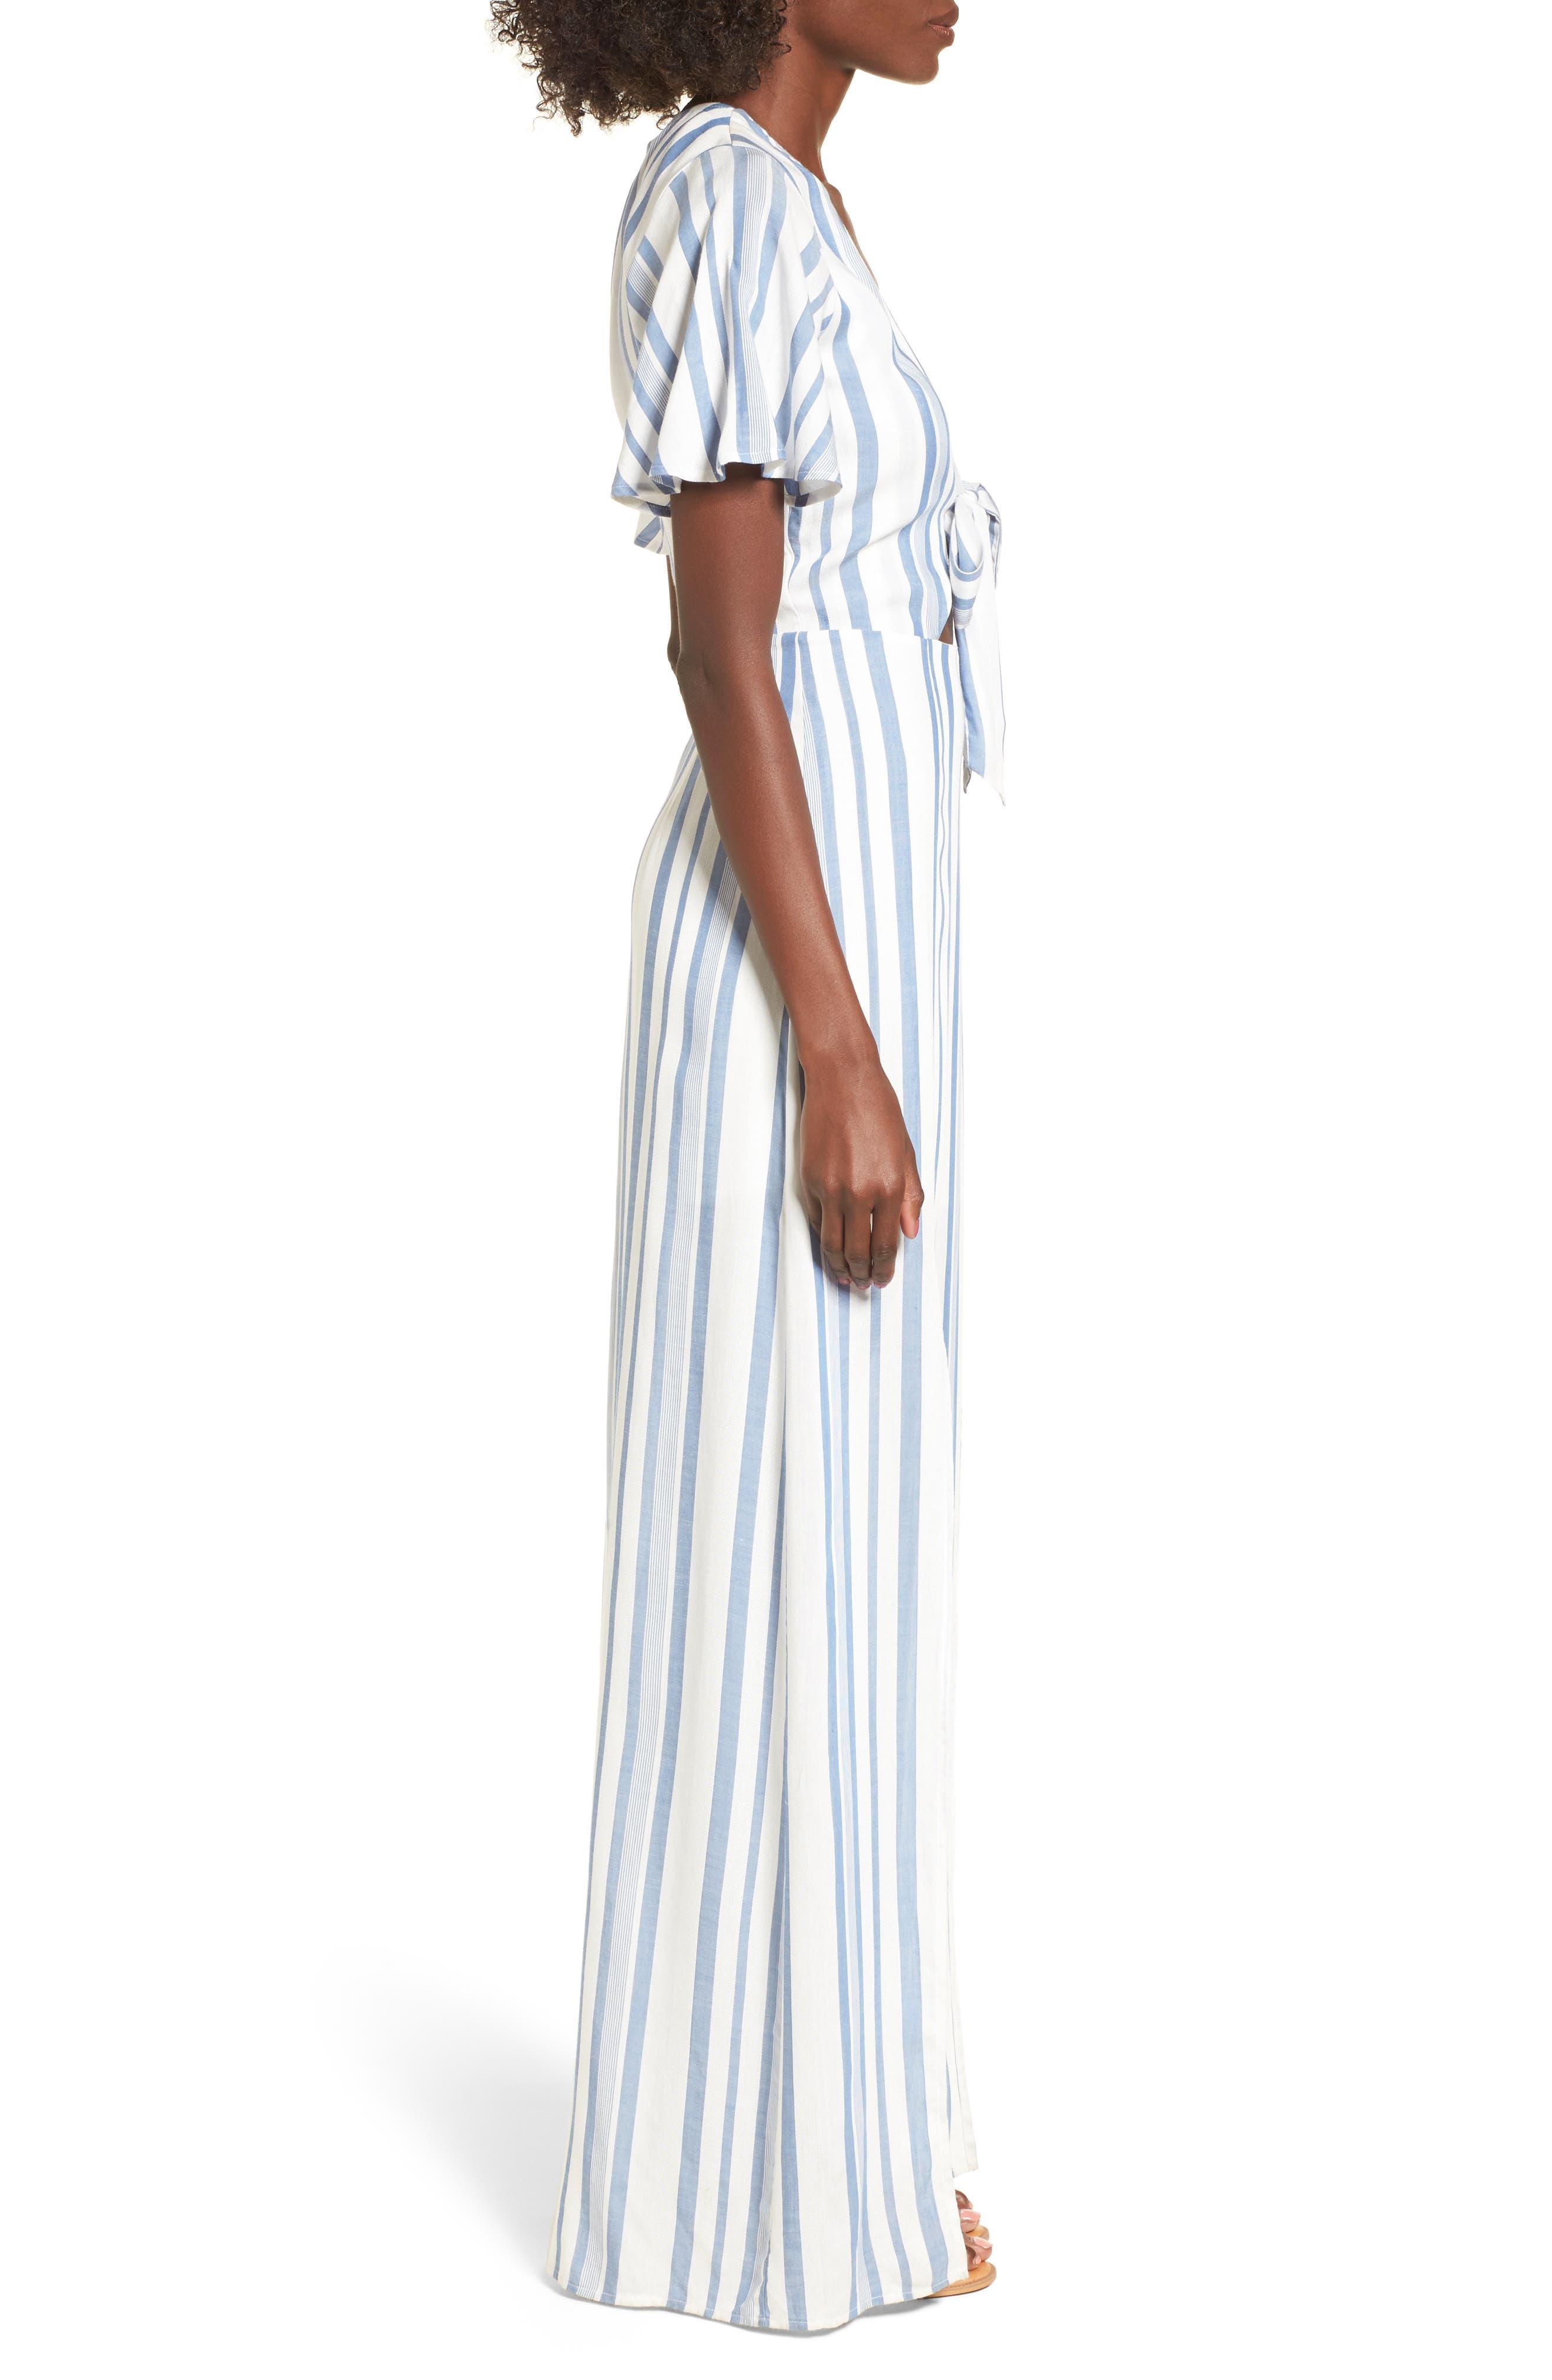 Bow Front Marina Maxi Dress,                             Alternate thumbnail 3, color,                             White/ Blue